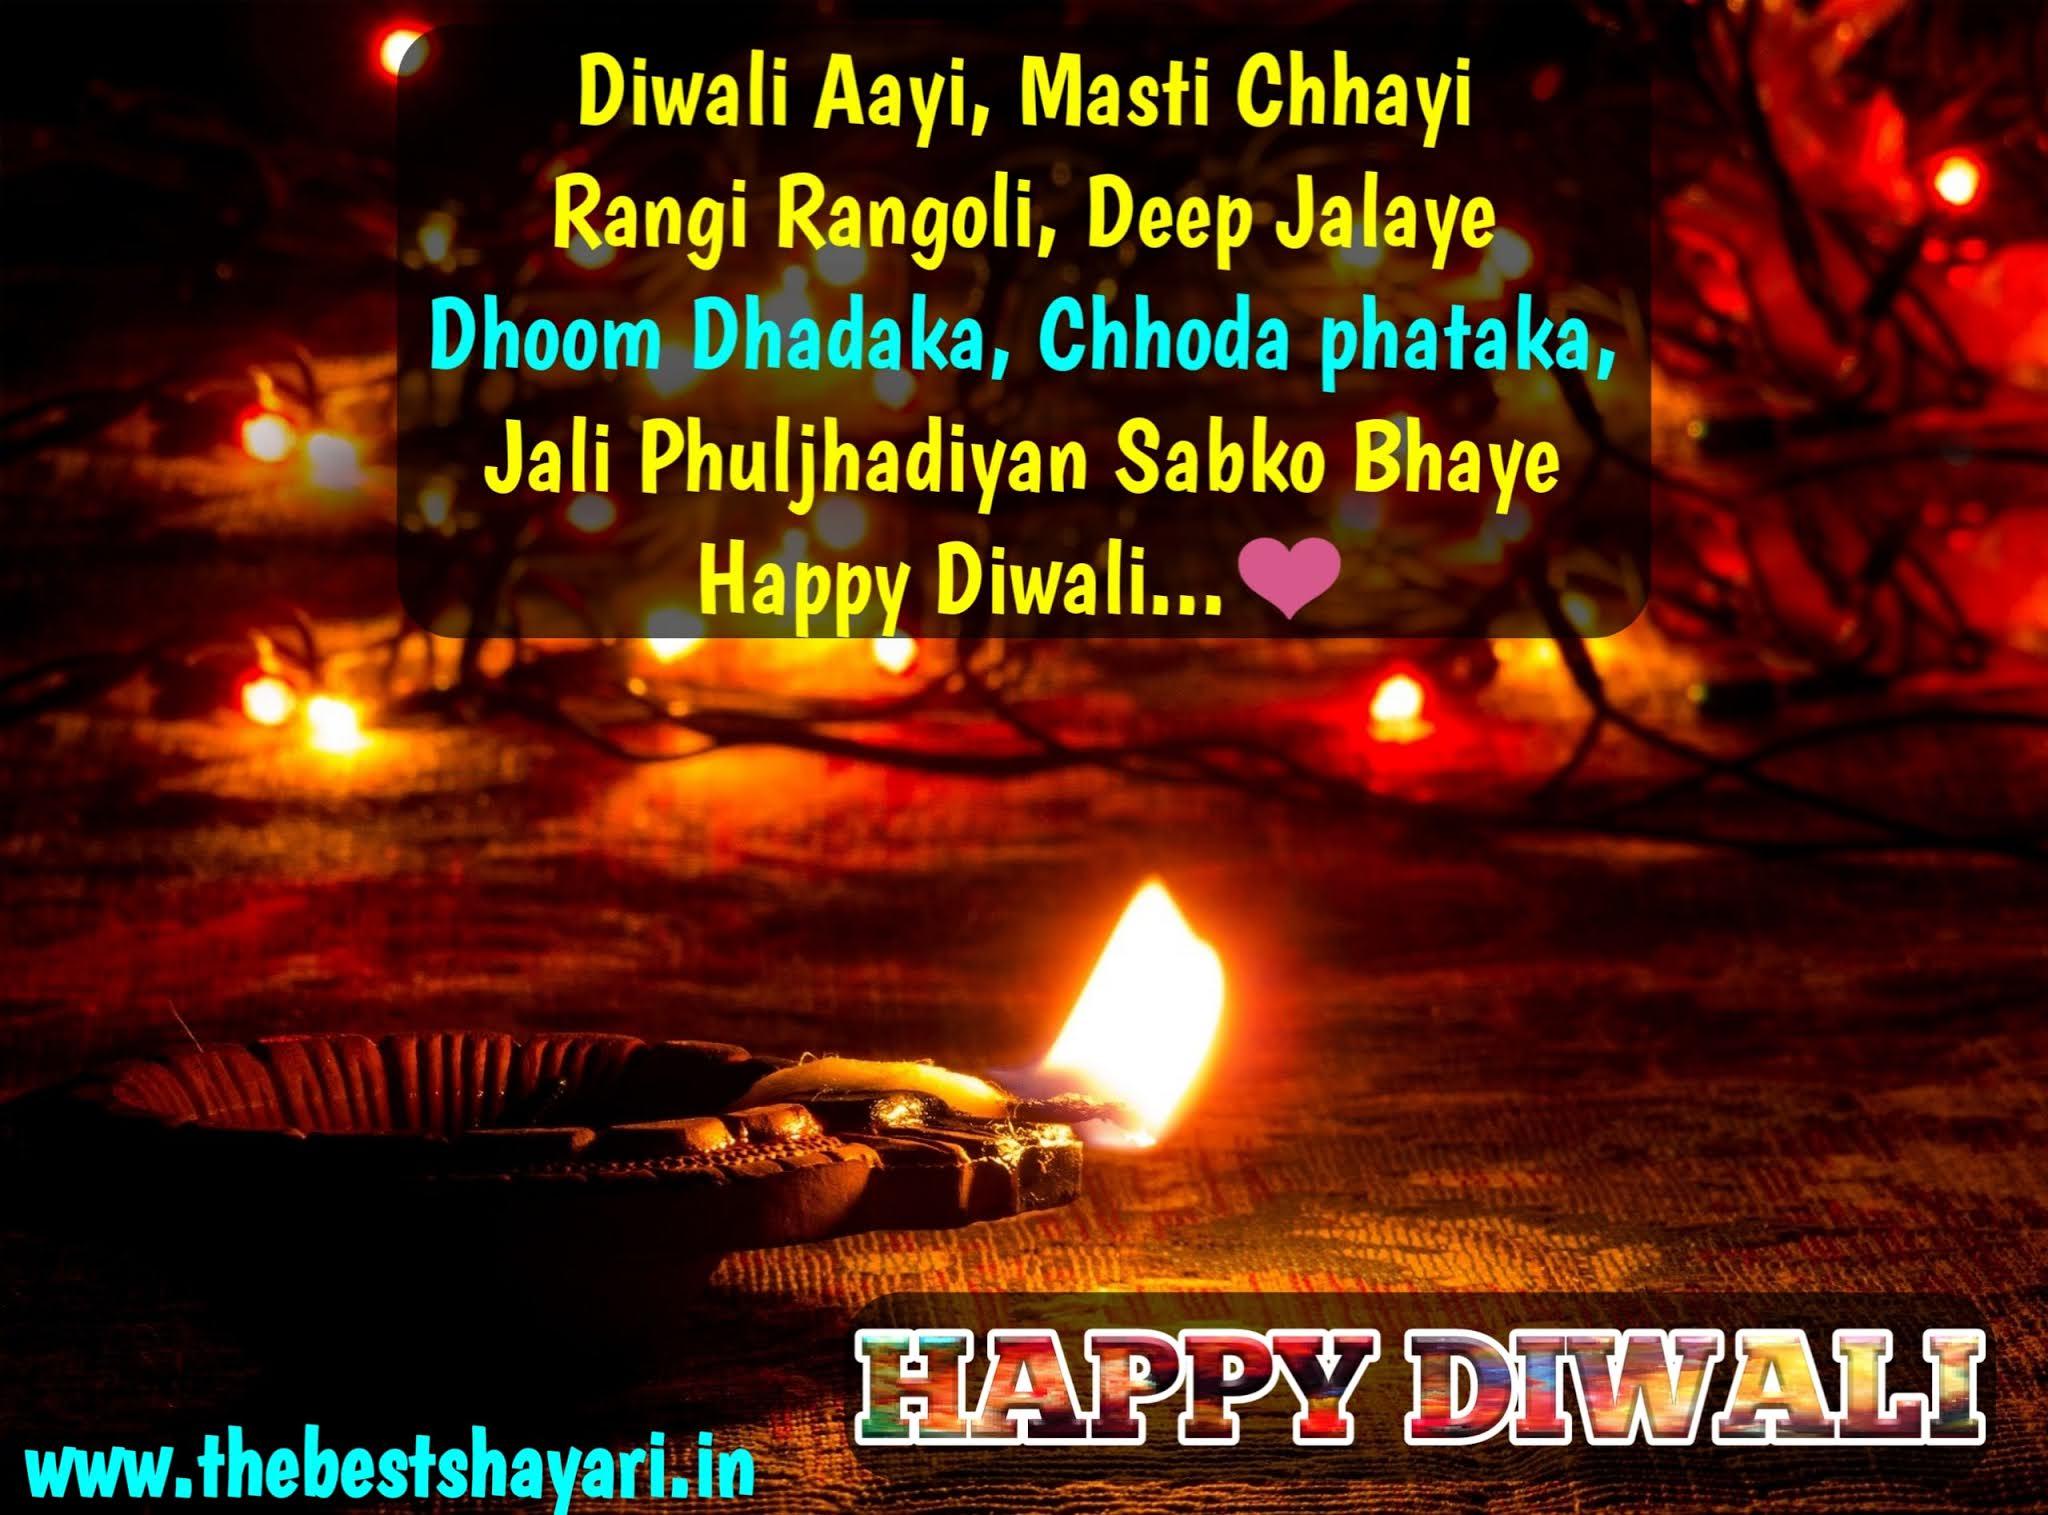 deepavali wishes in English